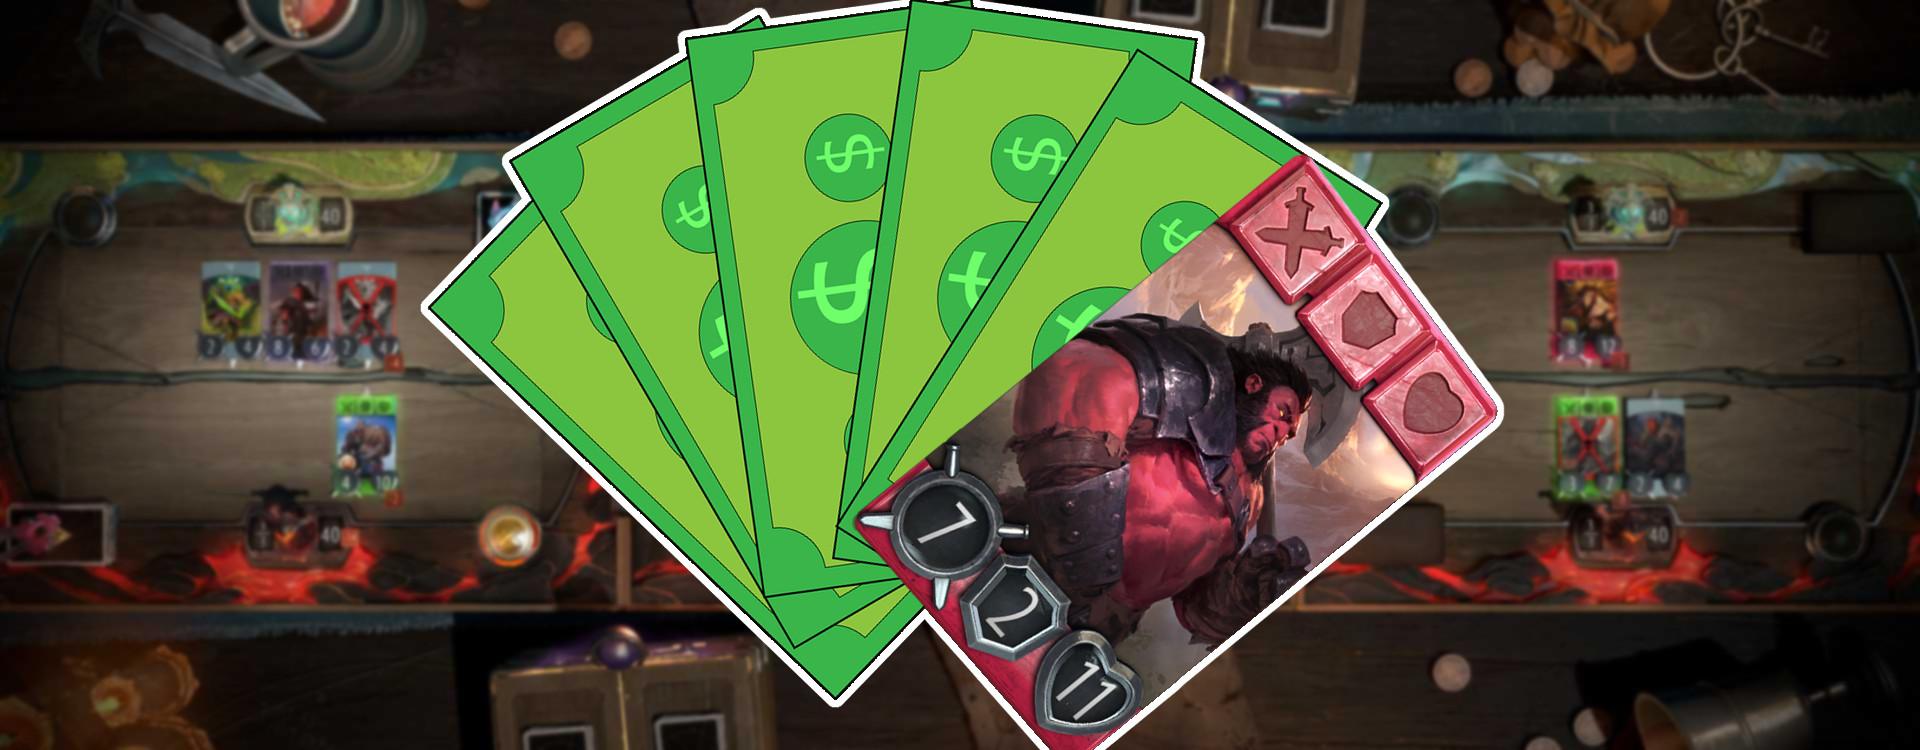 Artifact Axe kostet viel Geld